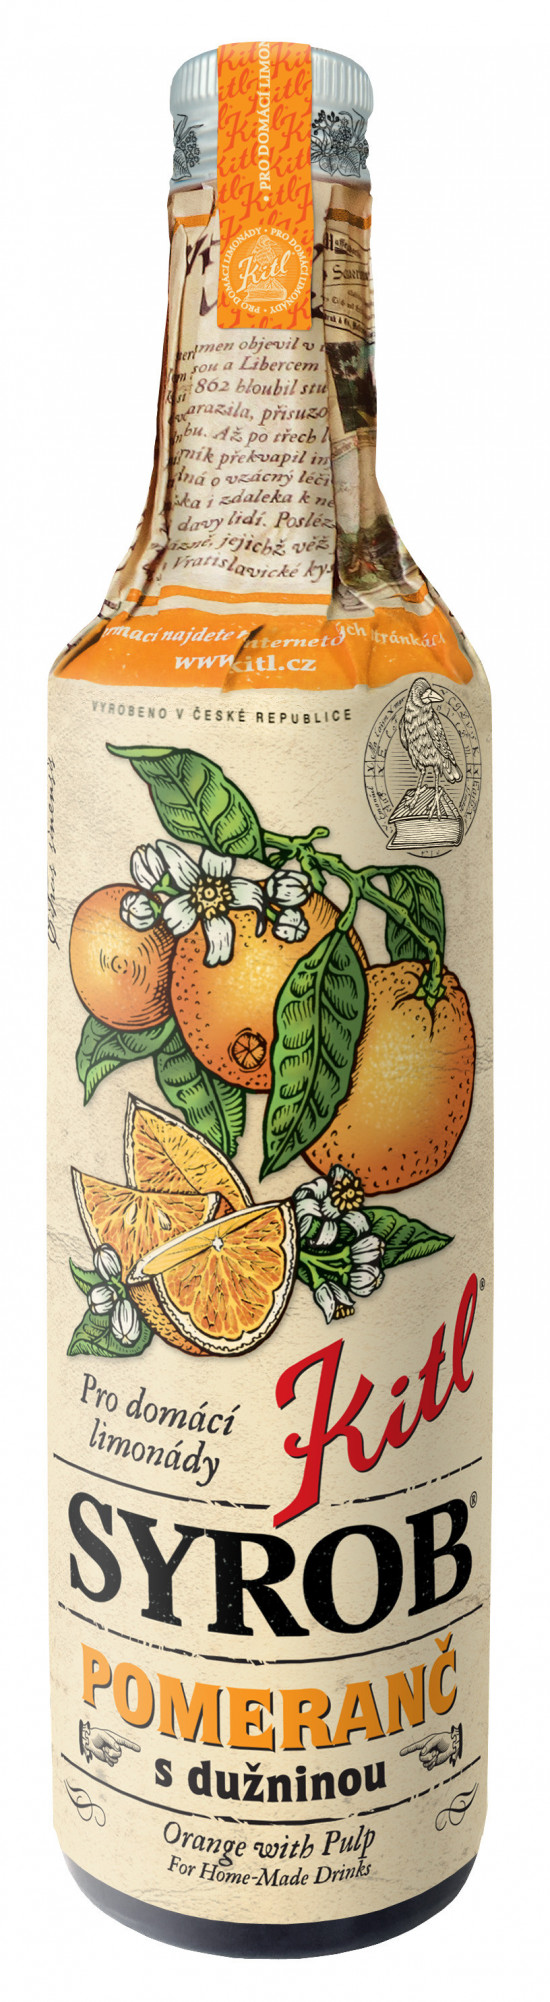 Hustý ovocný sirup, Kitl Syrob Pomeranč s dužninou, 500 ml